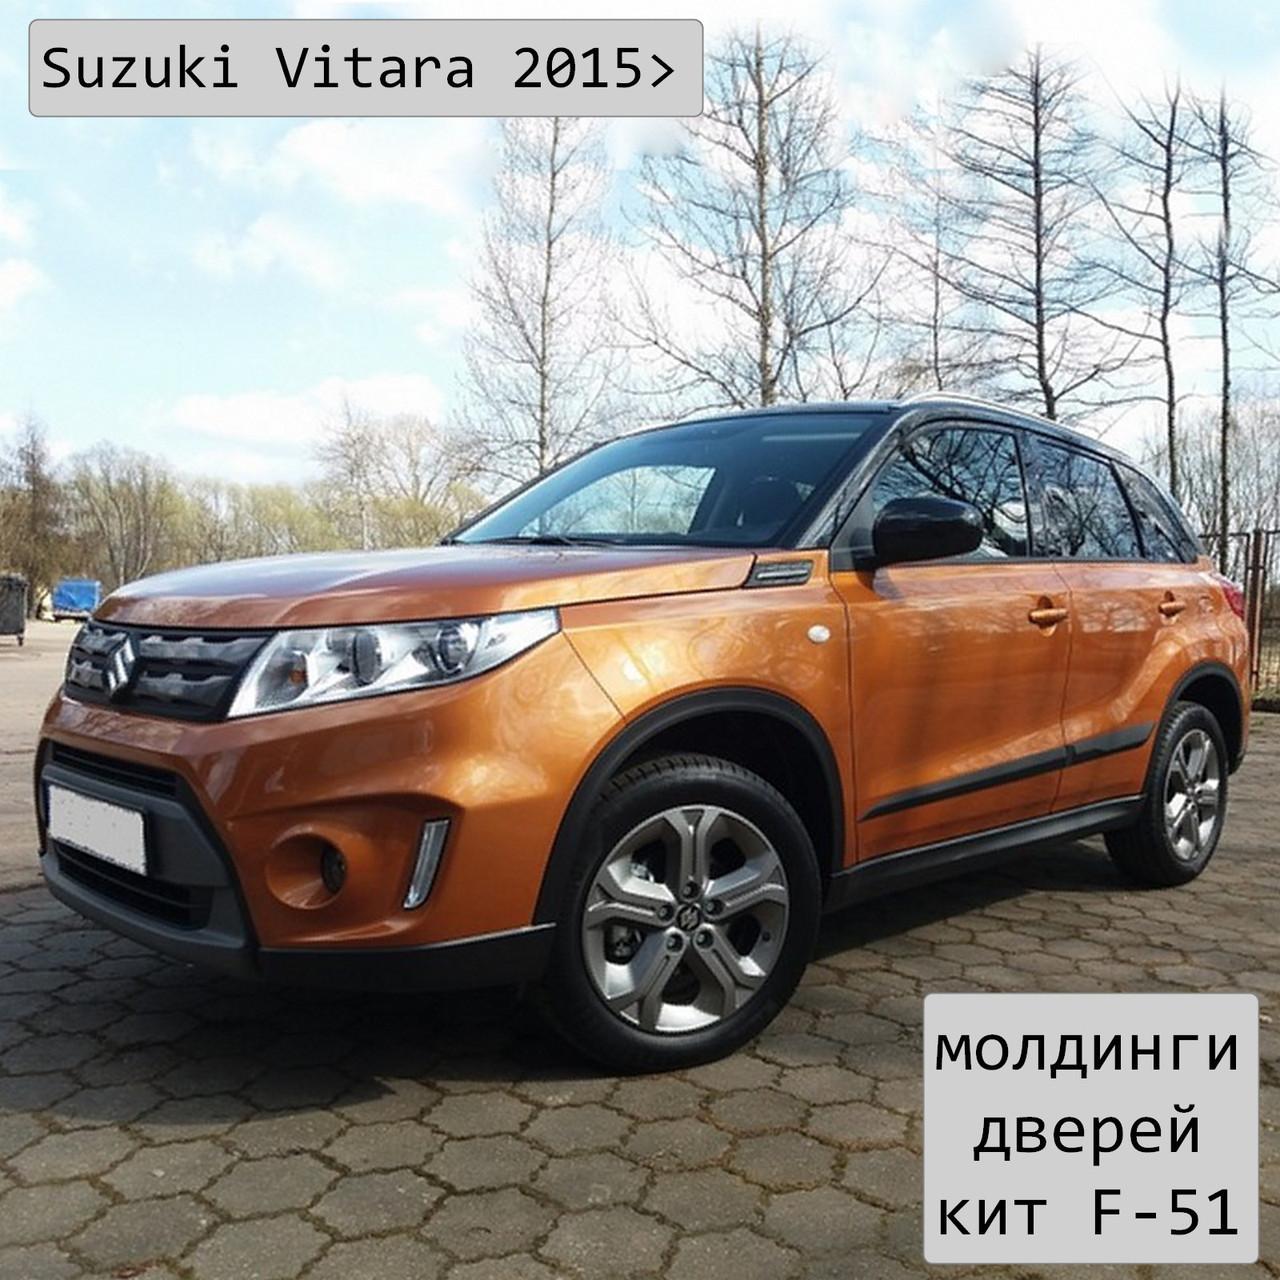 Молдинги на двери Suzuki Vitara 2015+